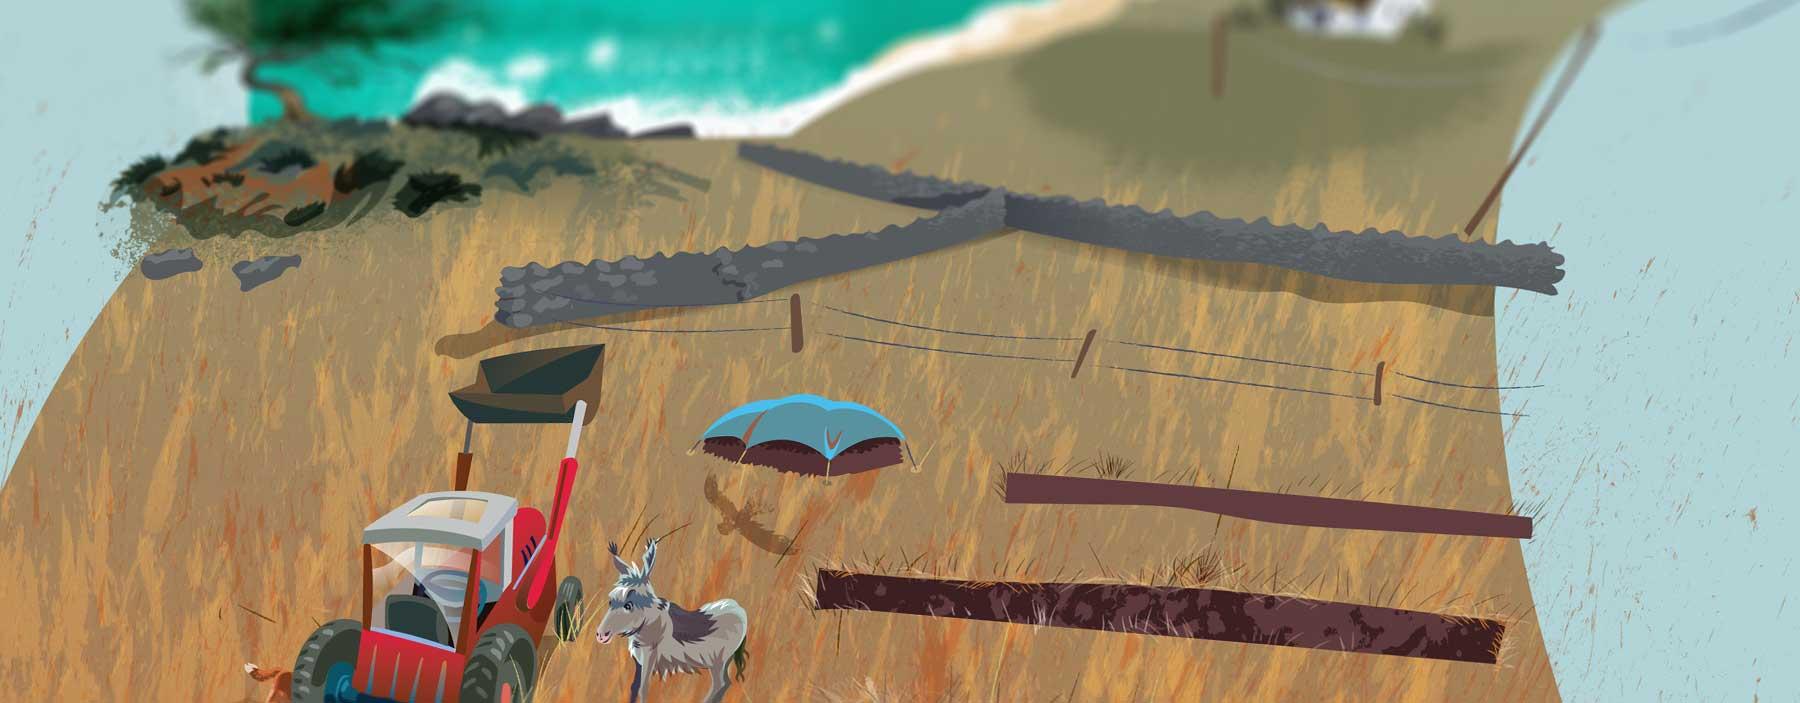 Kids Storytelling Poster of a West Atlantic Coast of Ireland